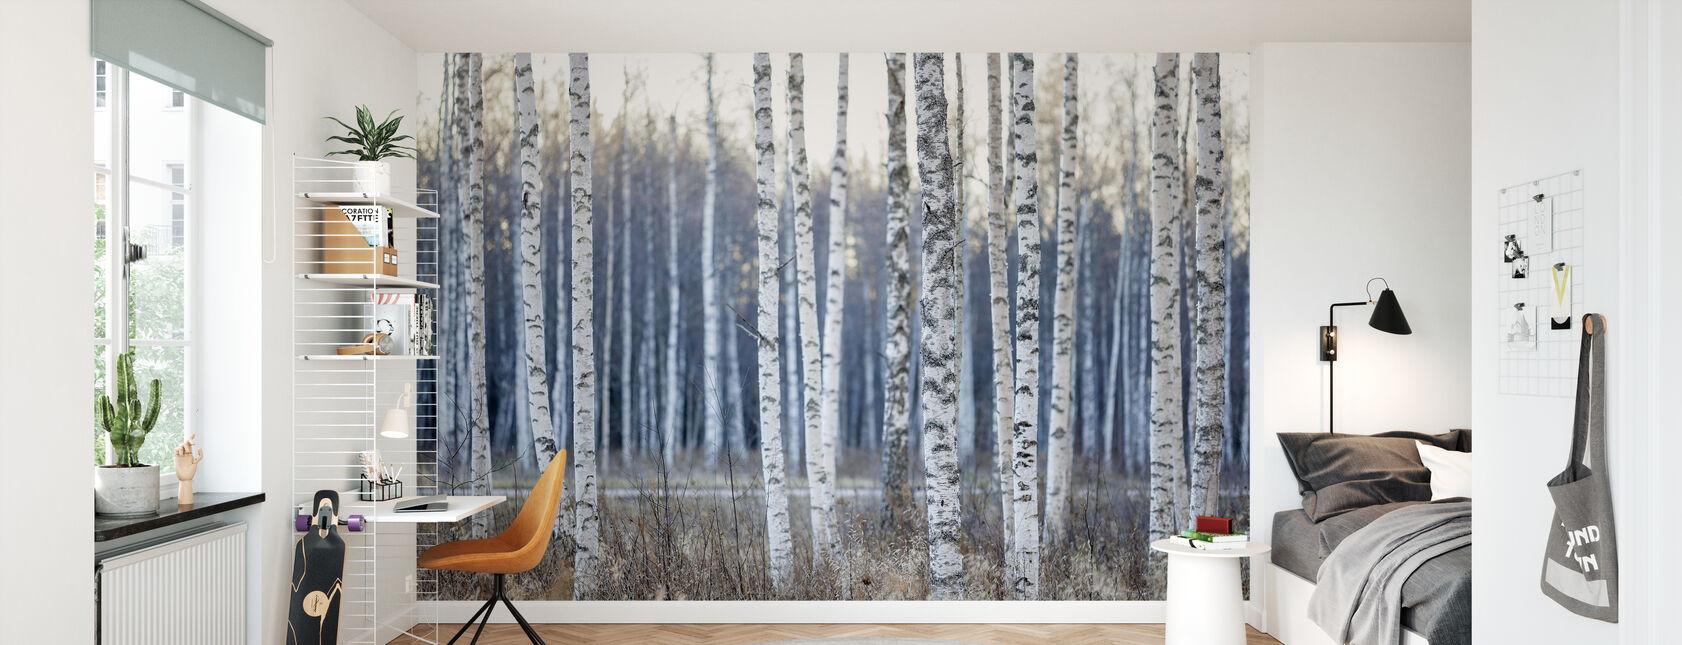 Birch Tree - Wallpaper - Kids Room